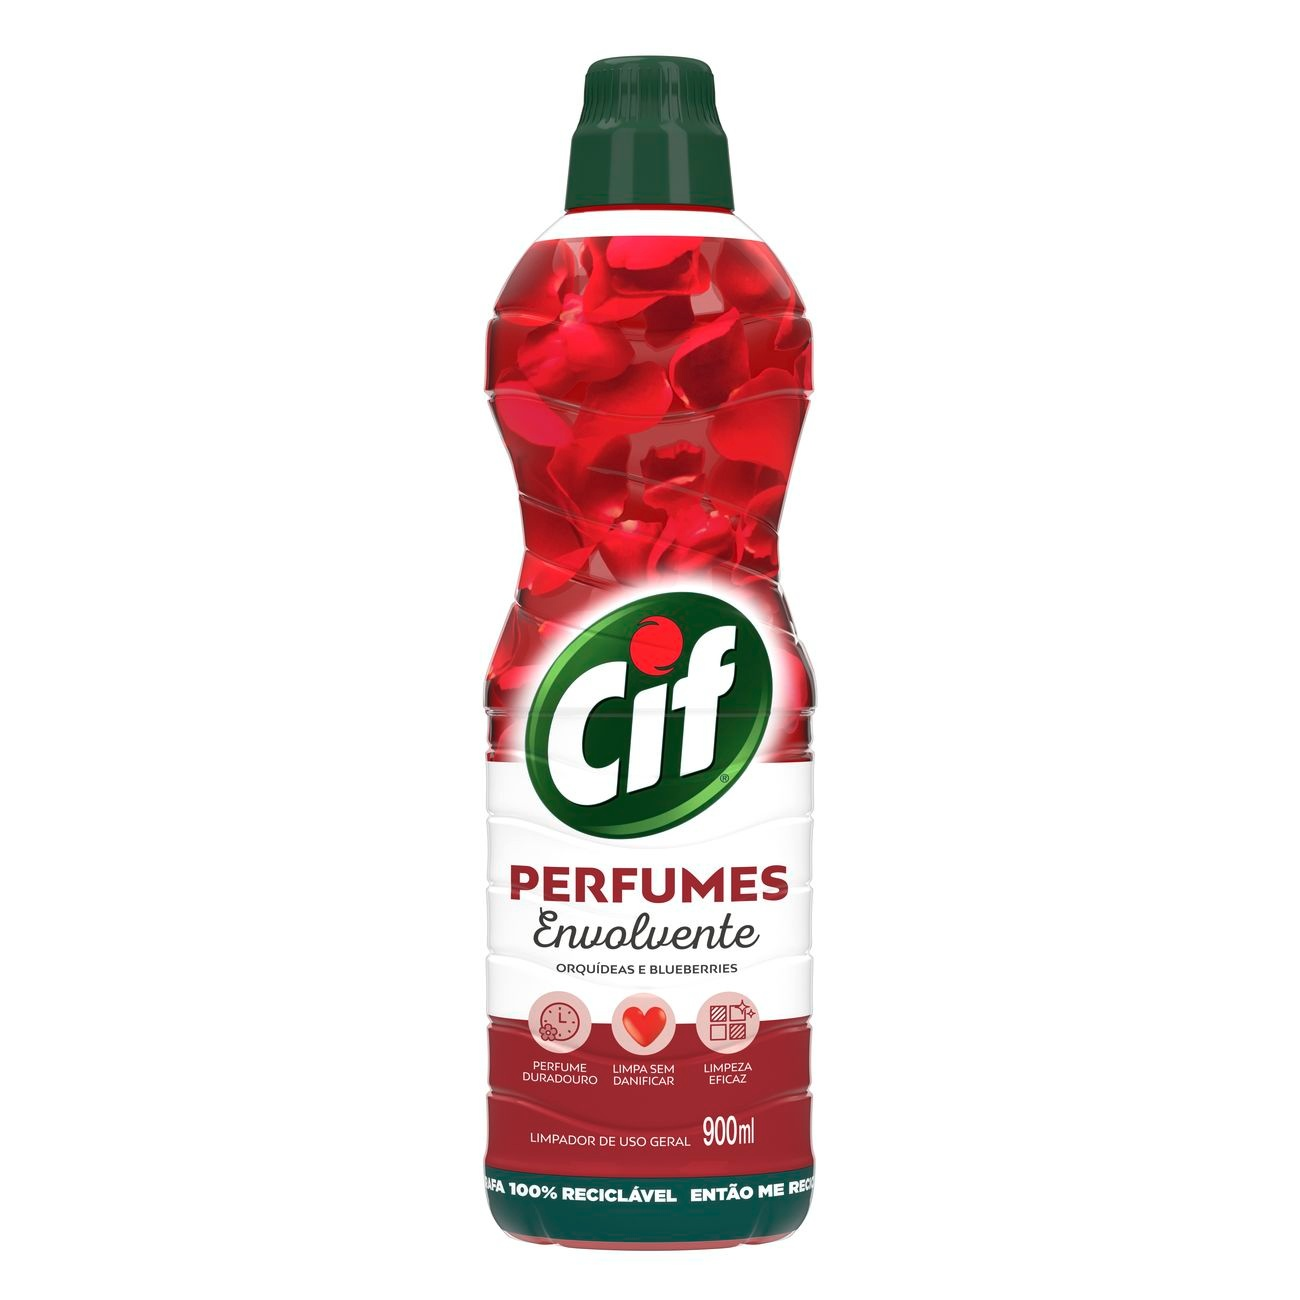 Limpa Pisos Cif Perfumes Envolvente 900mL